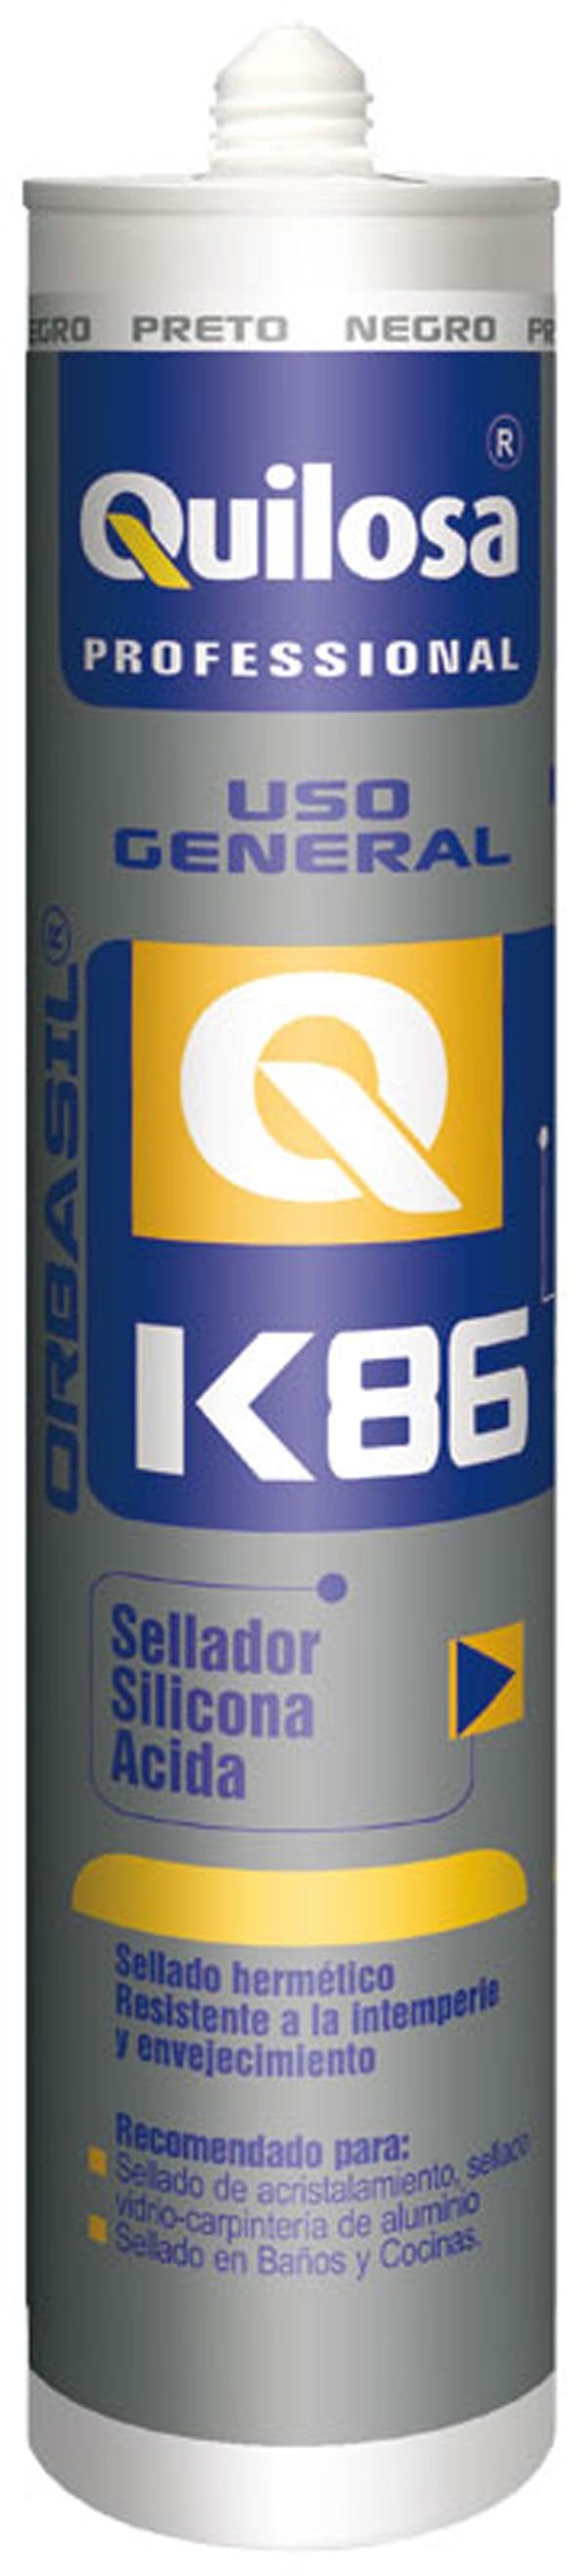 SILICONA CARTUCHO BLANCA K 86 ORBASIL 300 ML